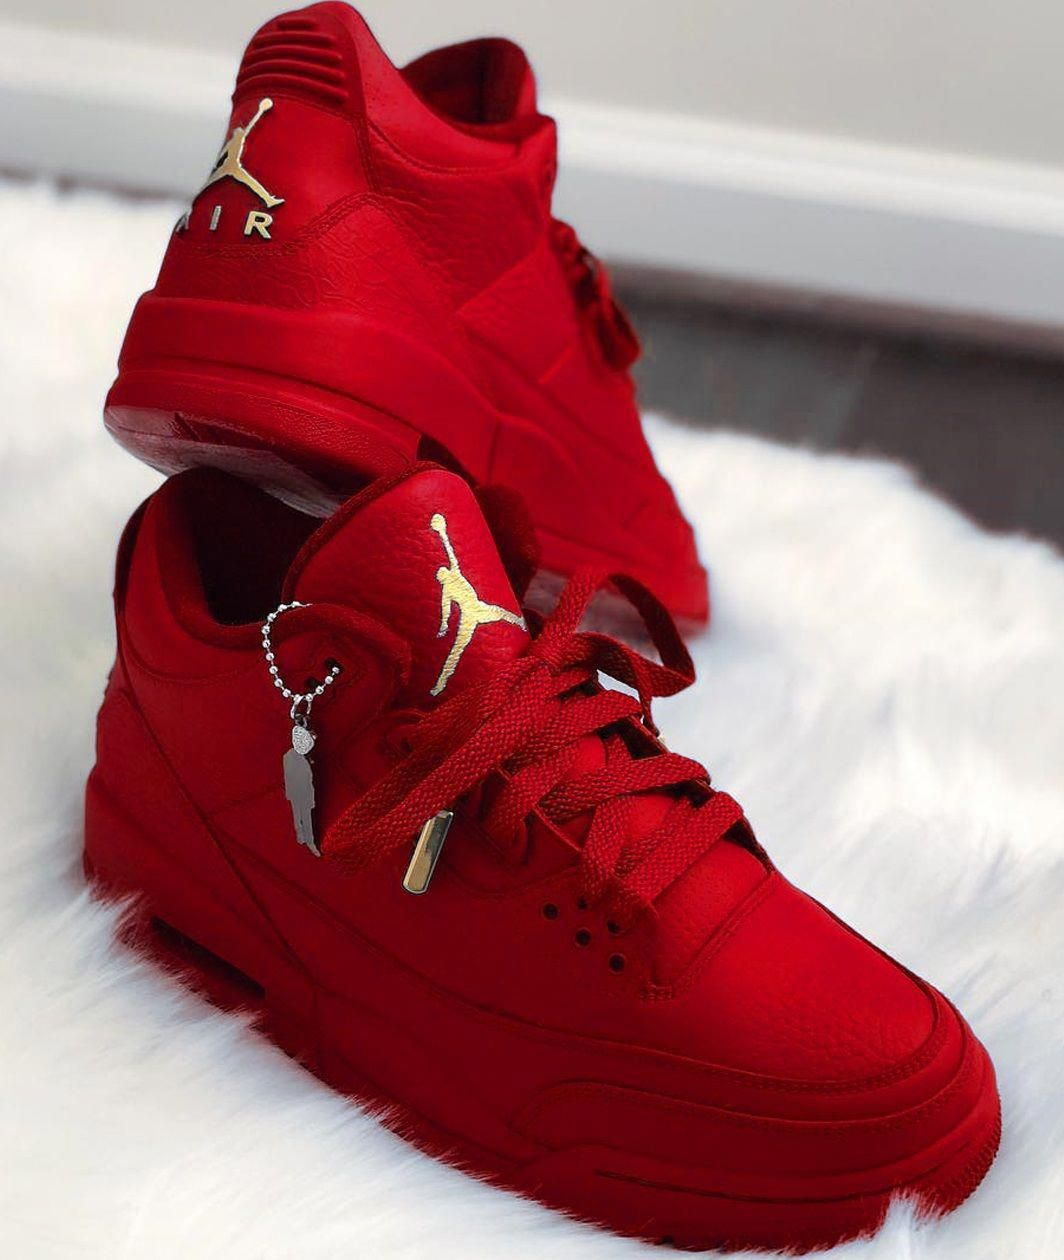 cheaper 0cb84 2aef5 Top 10 Air Jordan Custom Sneakers